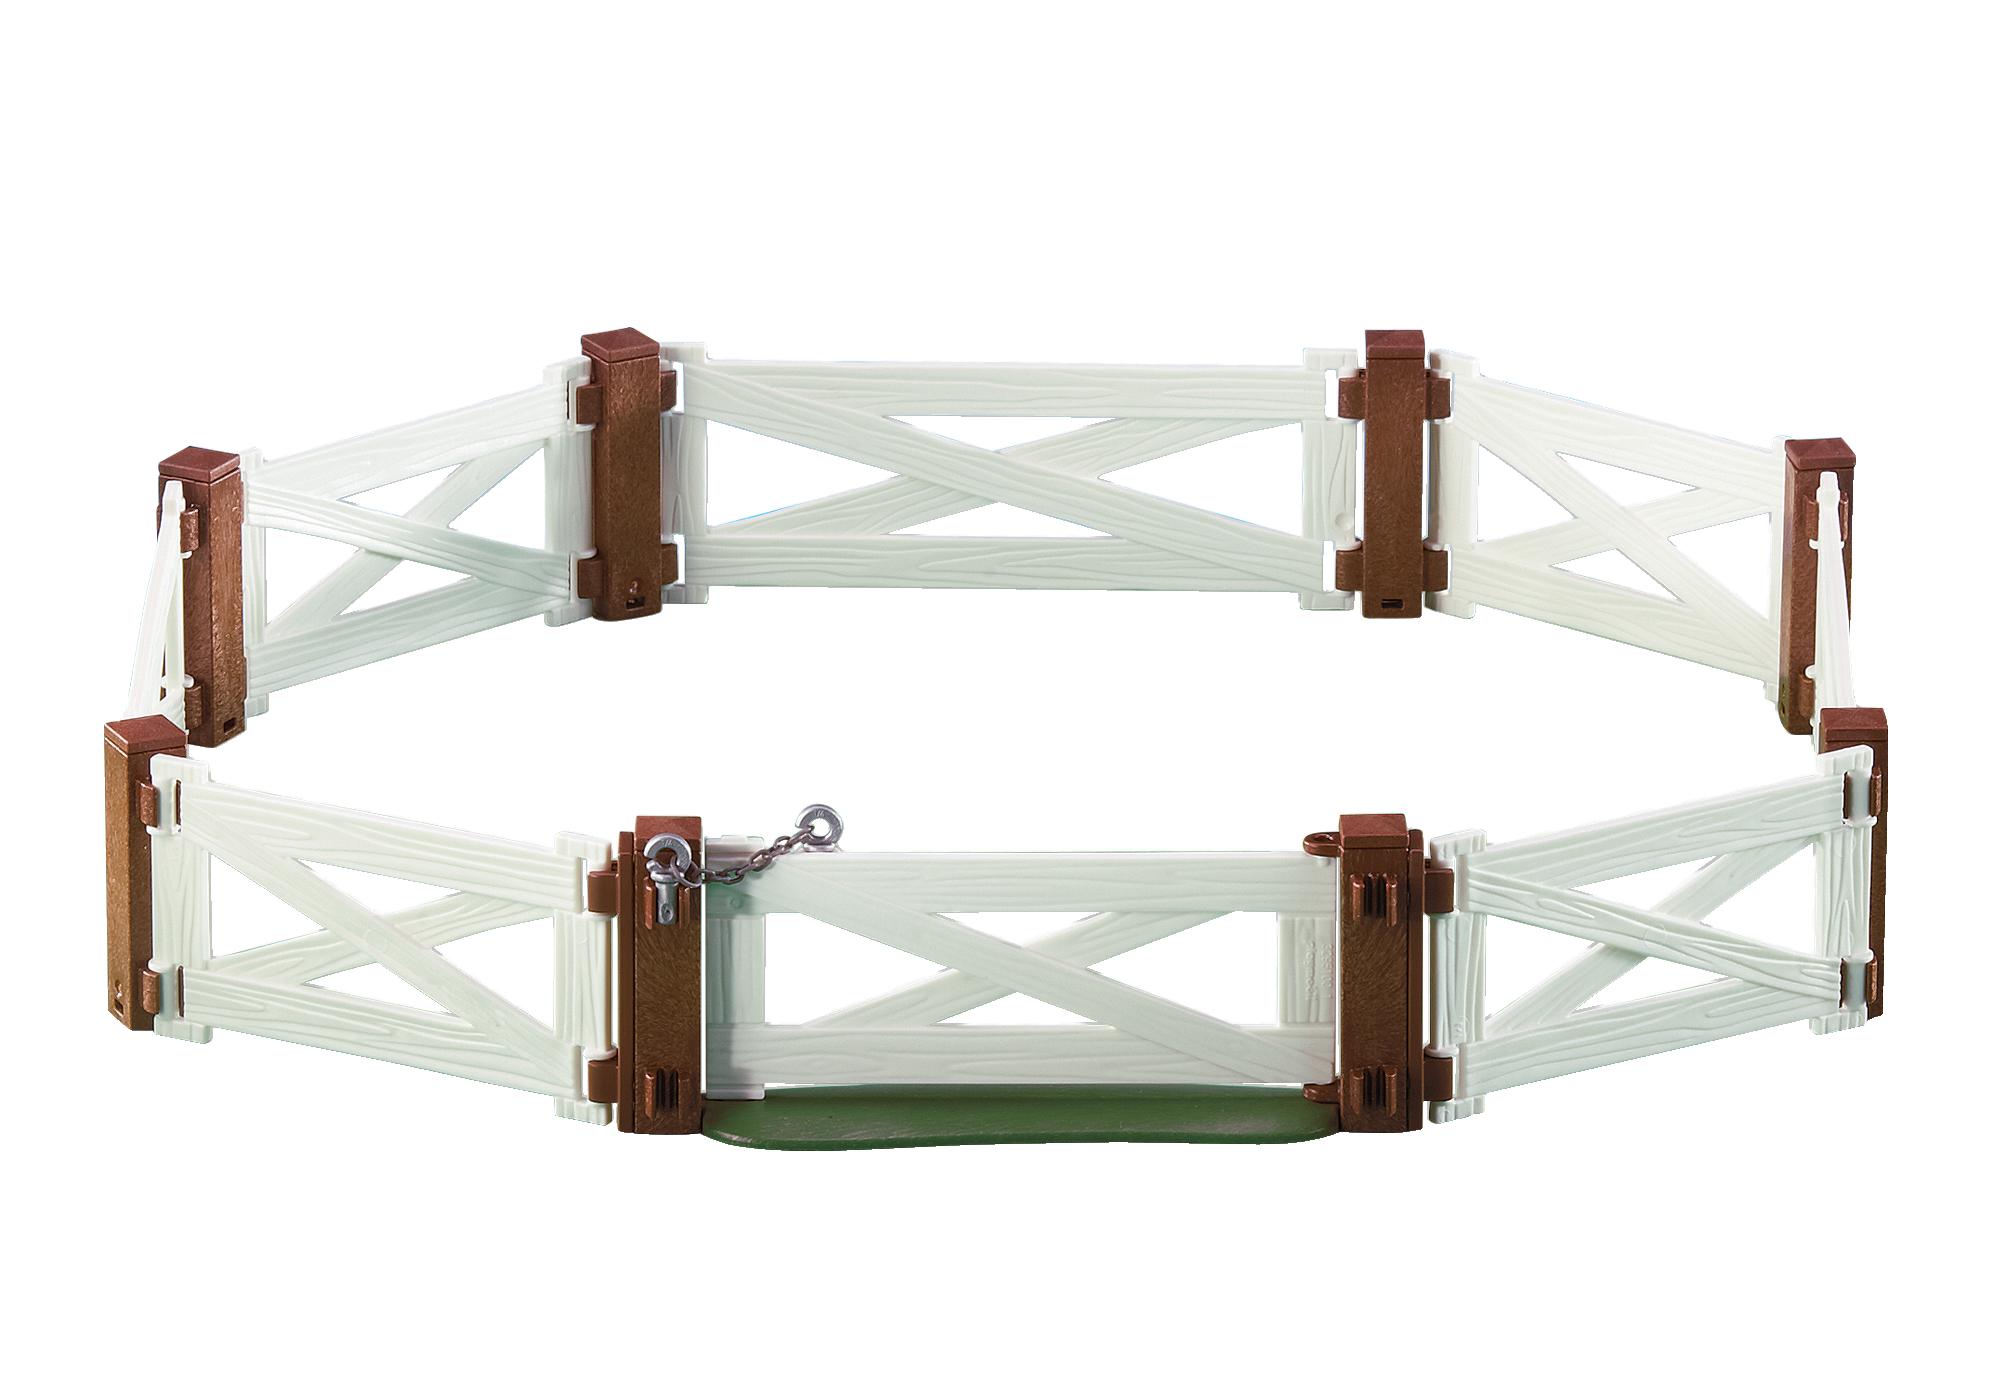 http://media.playmobil.com/i/playmobil/6473_product_detail/Επέκταση φράχτη για τη Φάρμα των Πόνυ